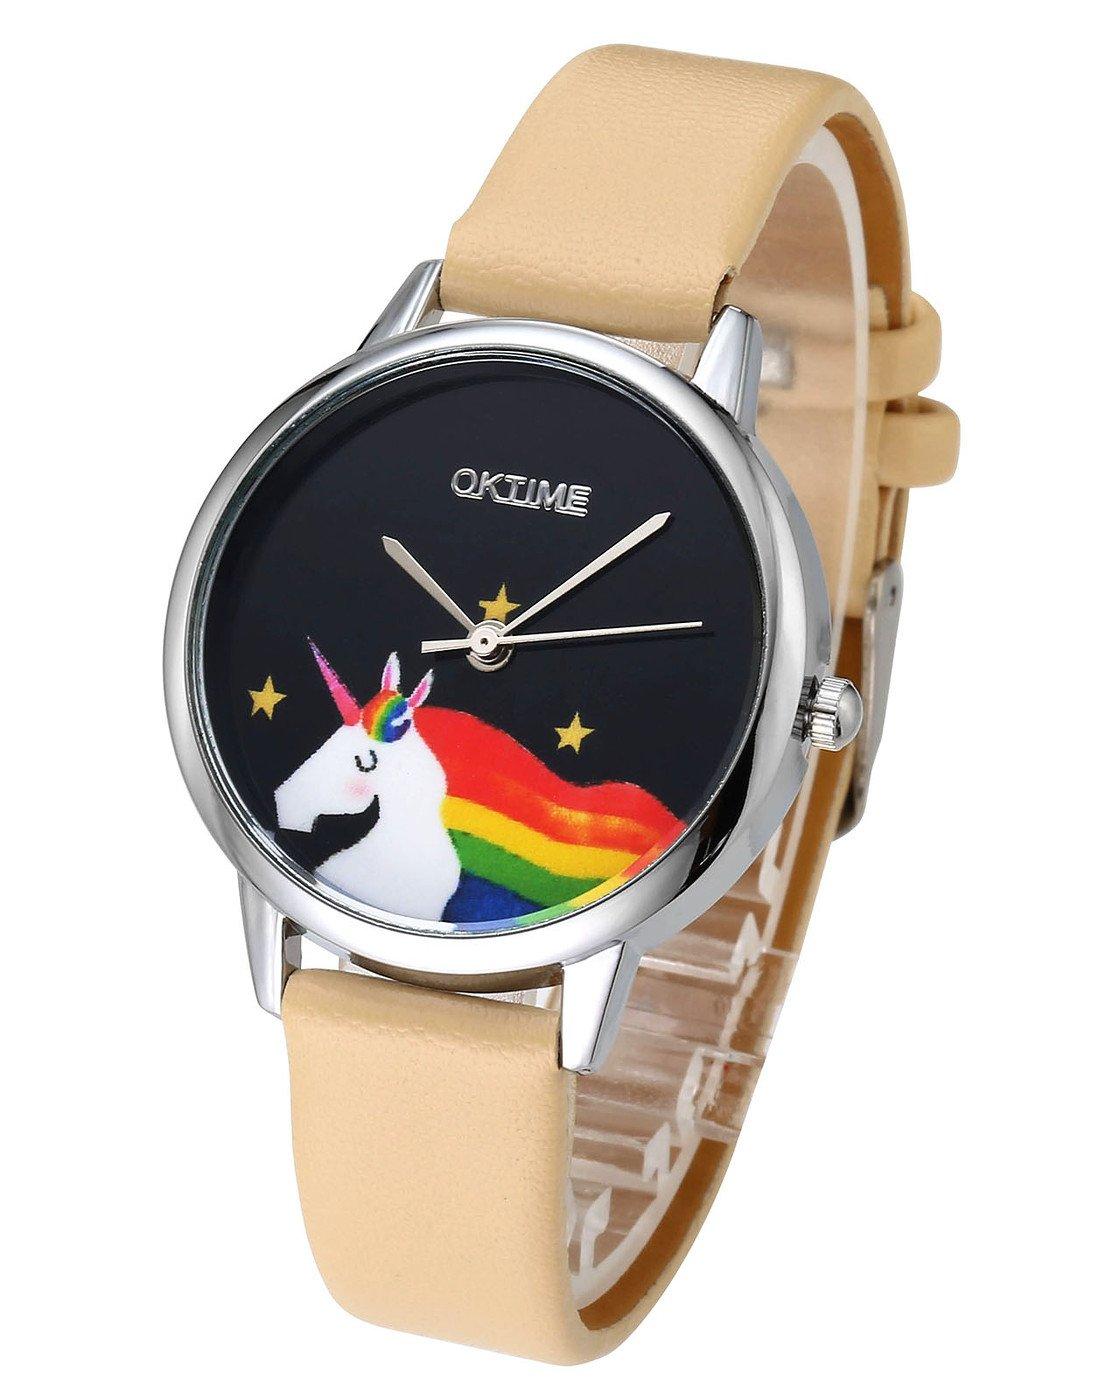 JSDDE Uhren, Cute Farbe Damen Armbanduhr Cartoon Einhorn Design Kleid Uhren Wasserdicht PU Lederband Silber Quarz Uhr,Khaki